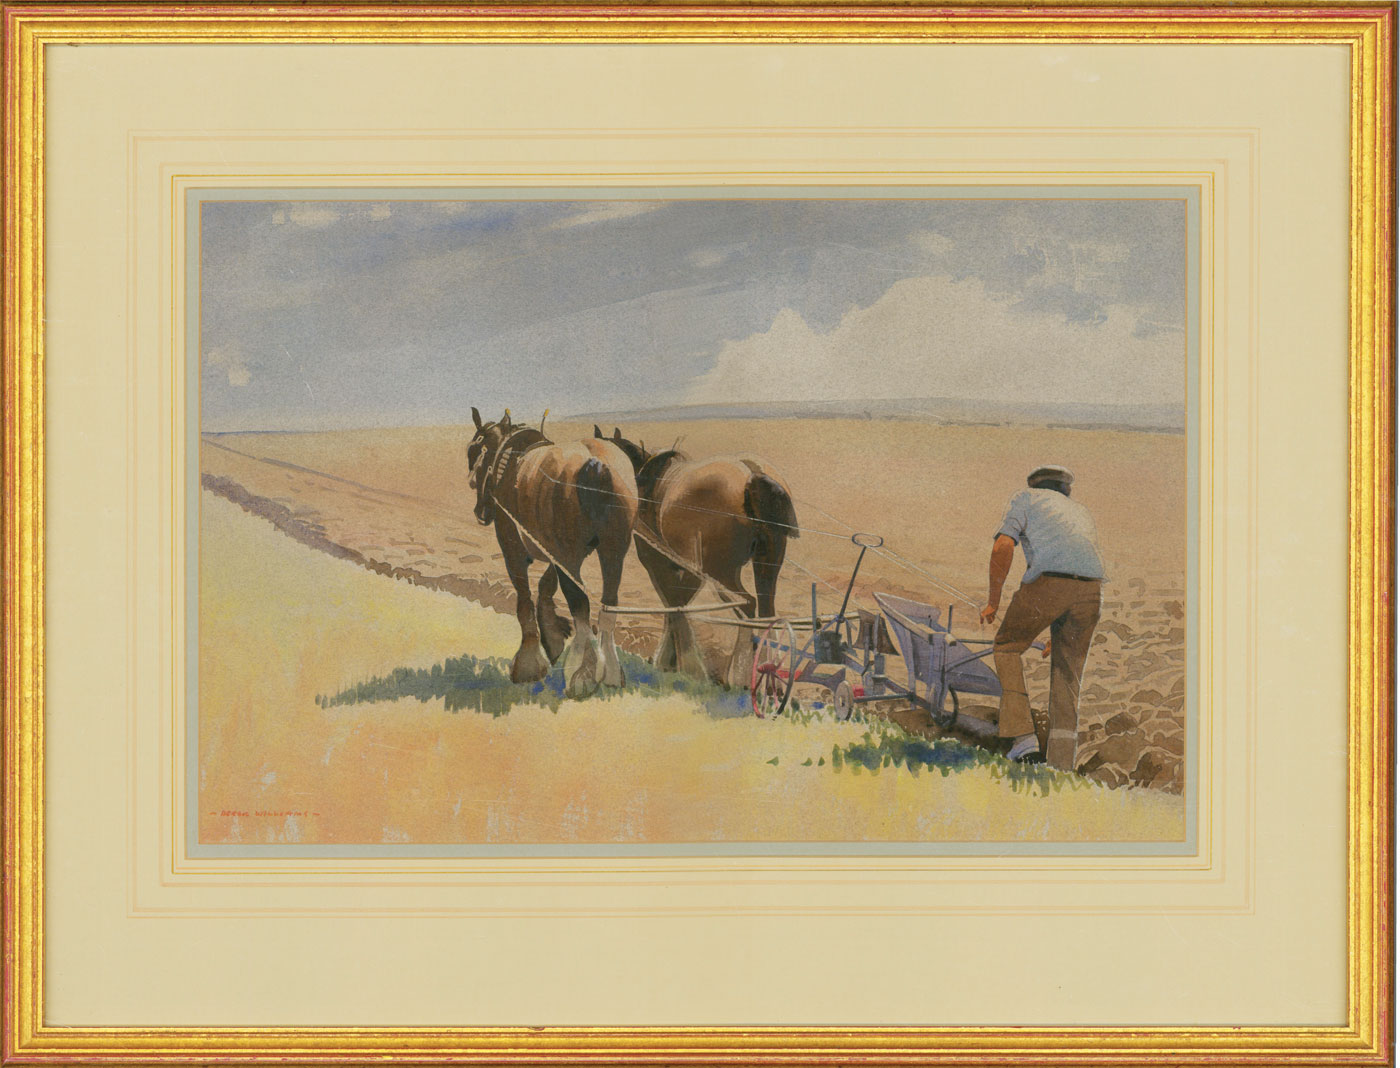 Derek Williams RBSA FRSA (1932-2009) - Signed Watercolour, Ploughing Top Field